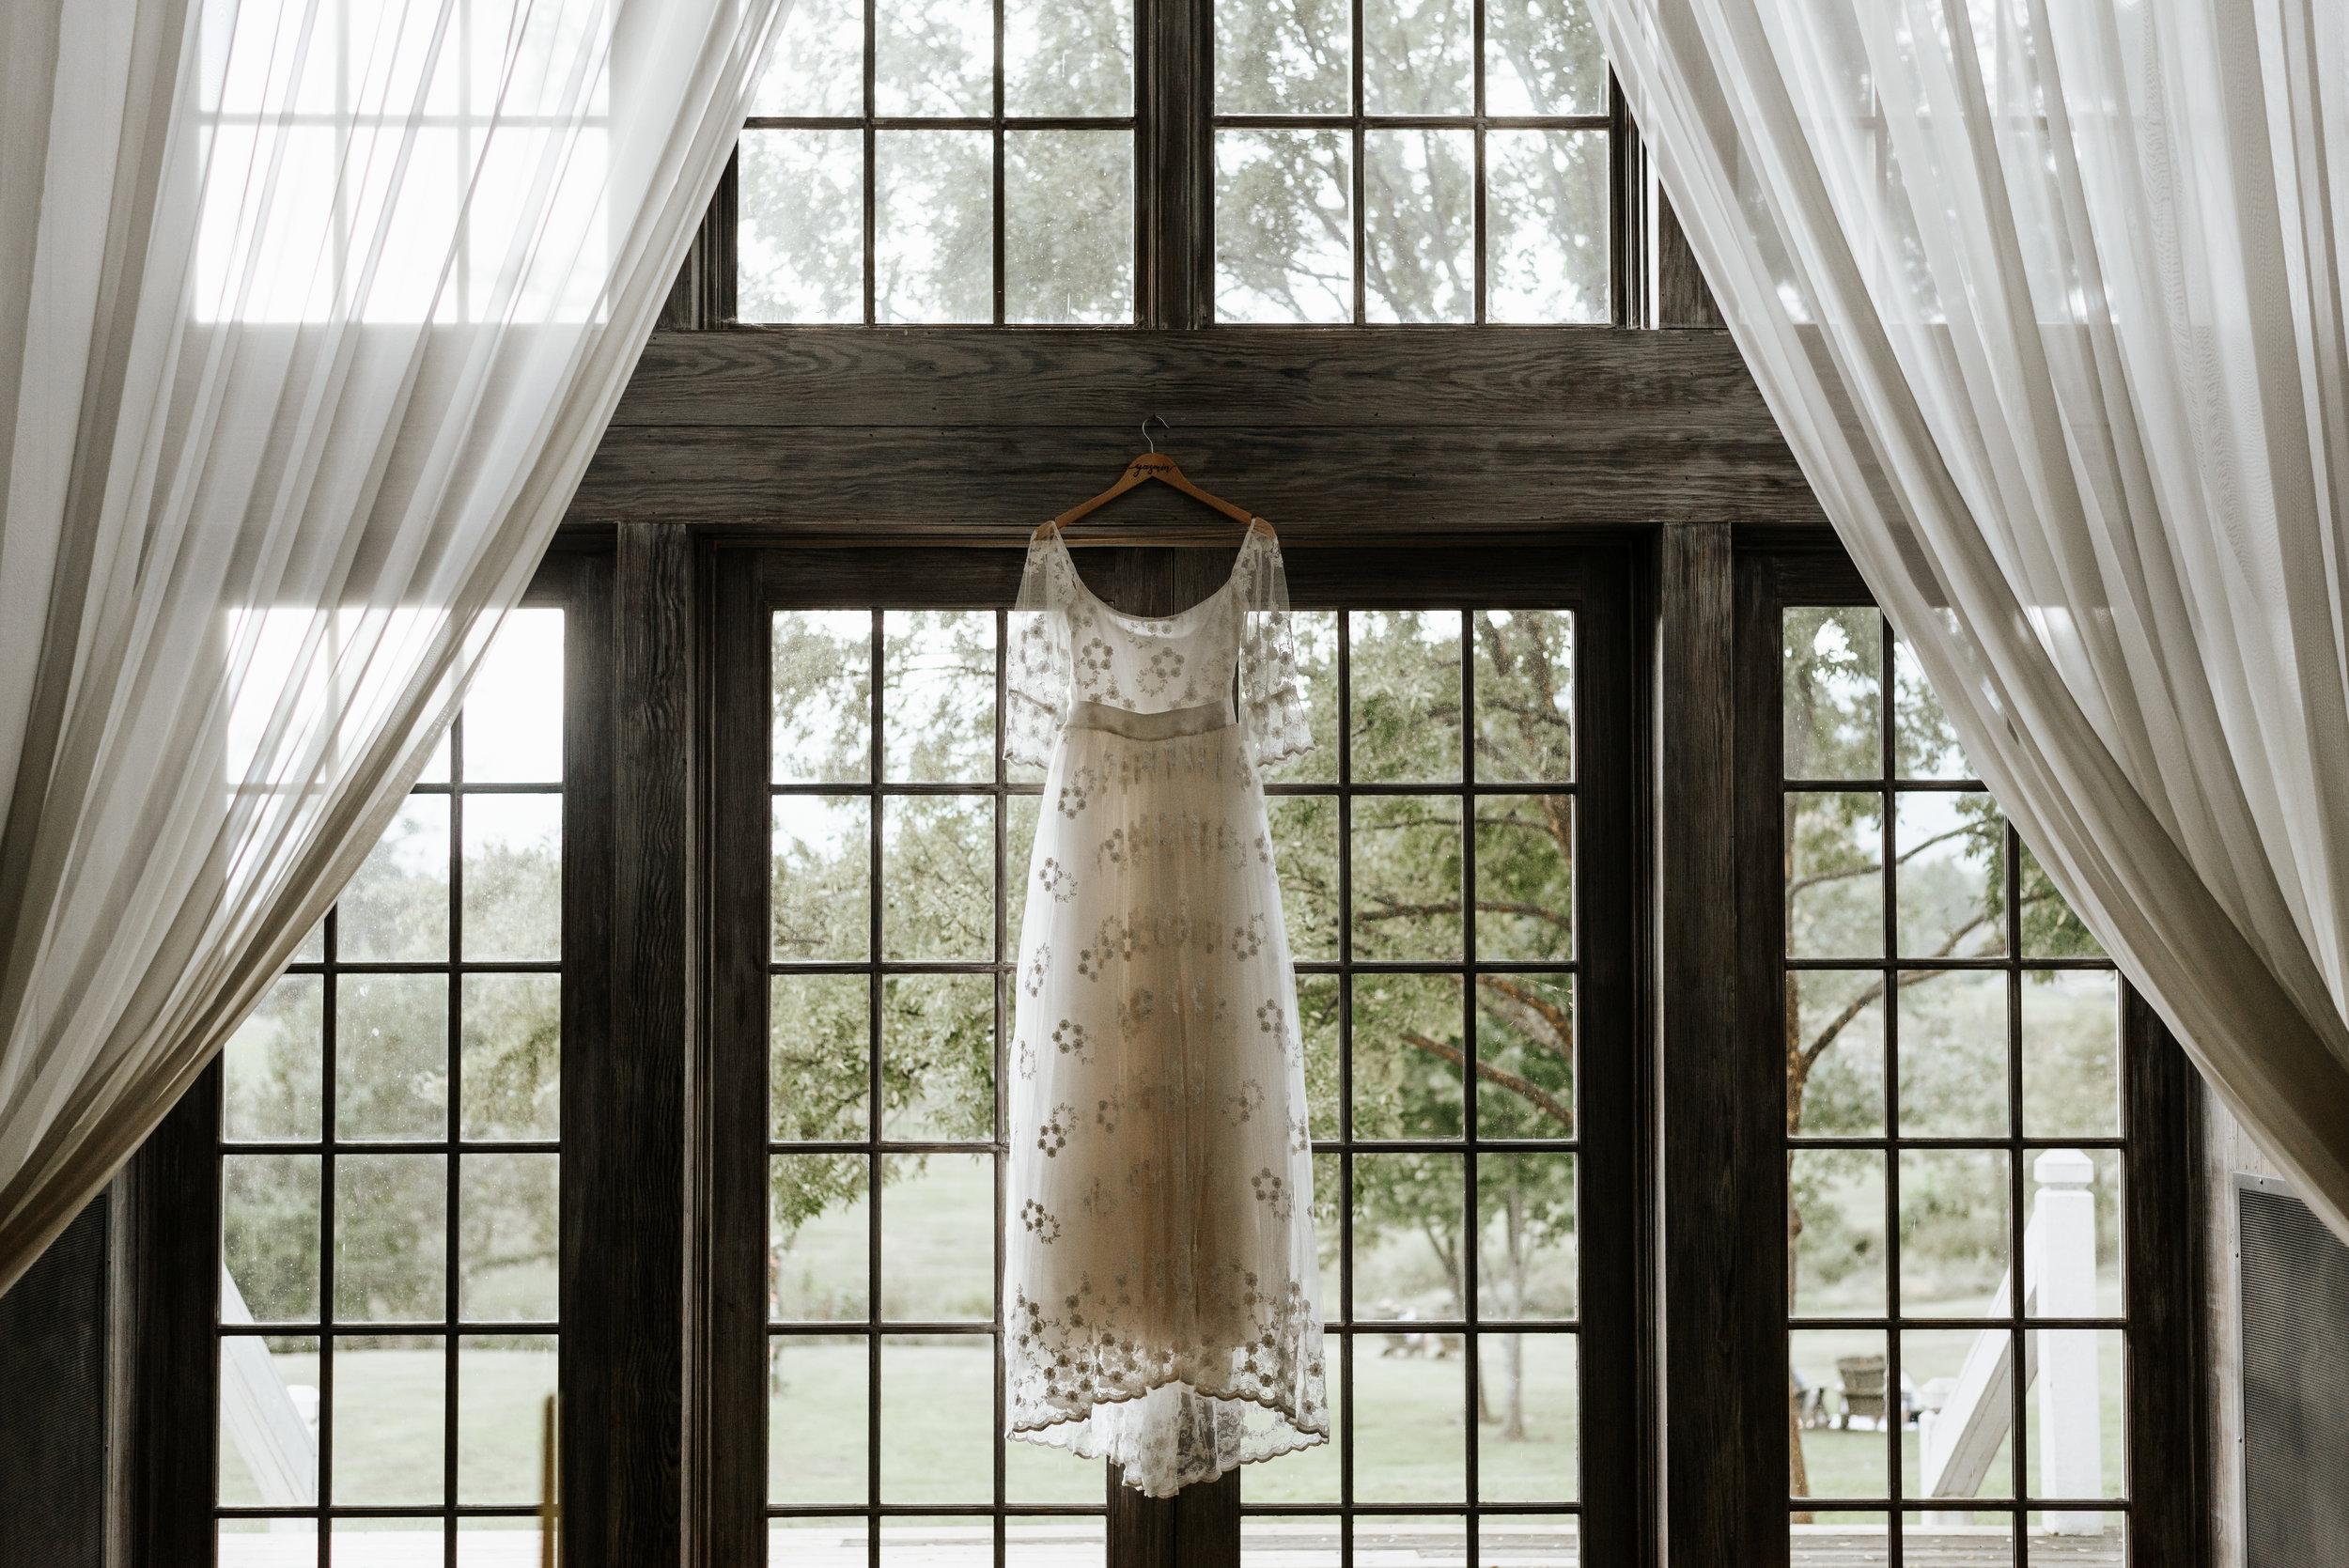 Veritas-Vineyards-and-Winery-Wedding-Photography-Afton-Virginia-Yasmin-Seth-Photography-by-V-8938.jpg